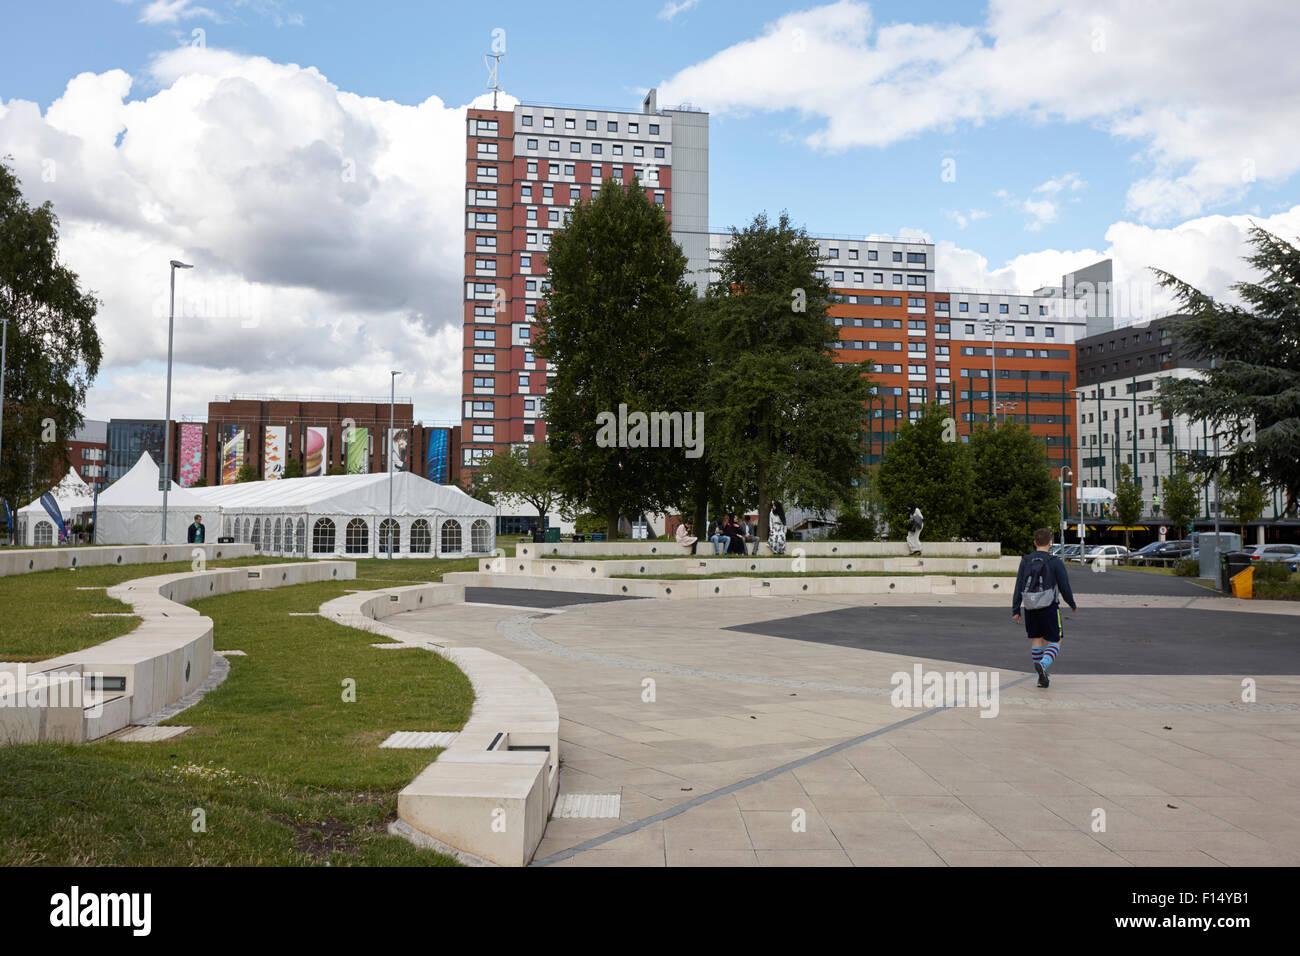 aston university campus Birmingham UK - Stock Image